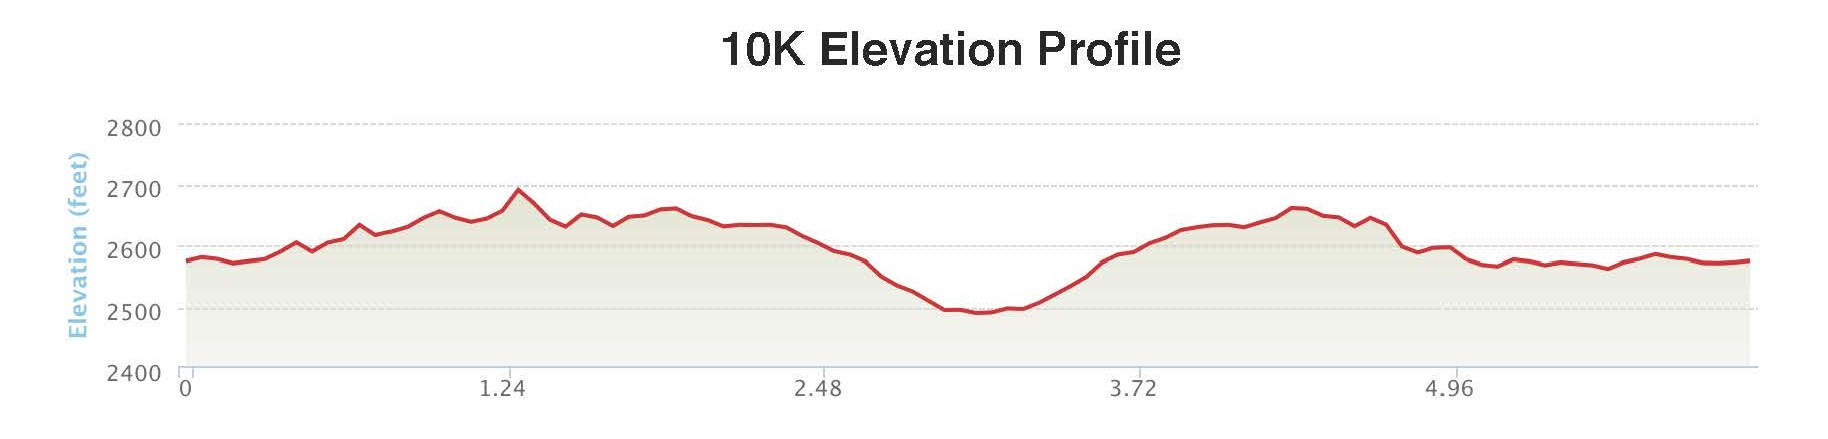 10K Elevation Profile